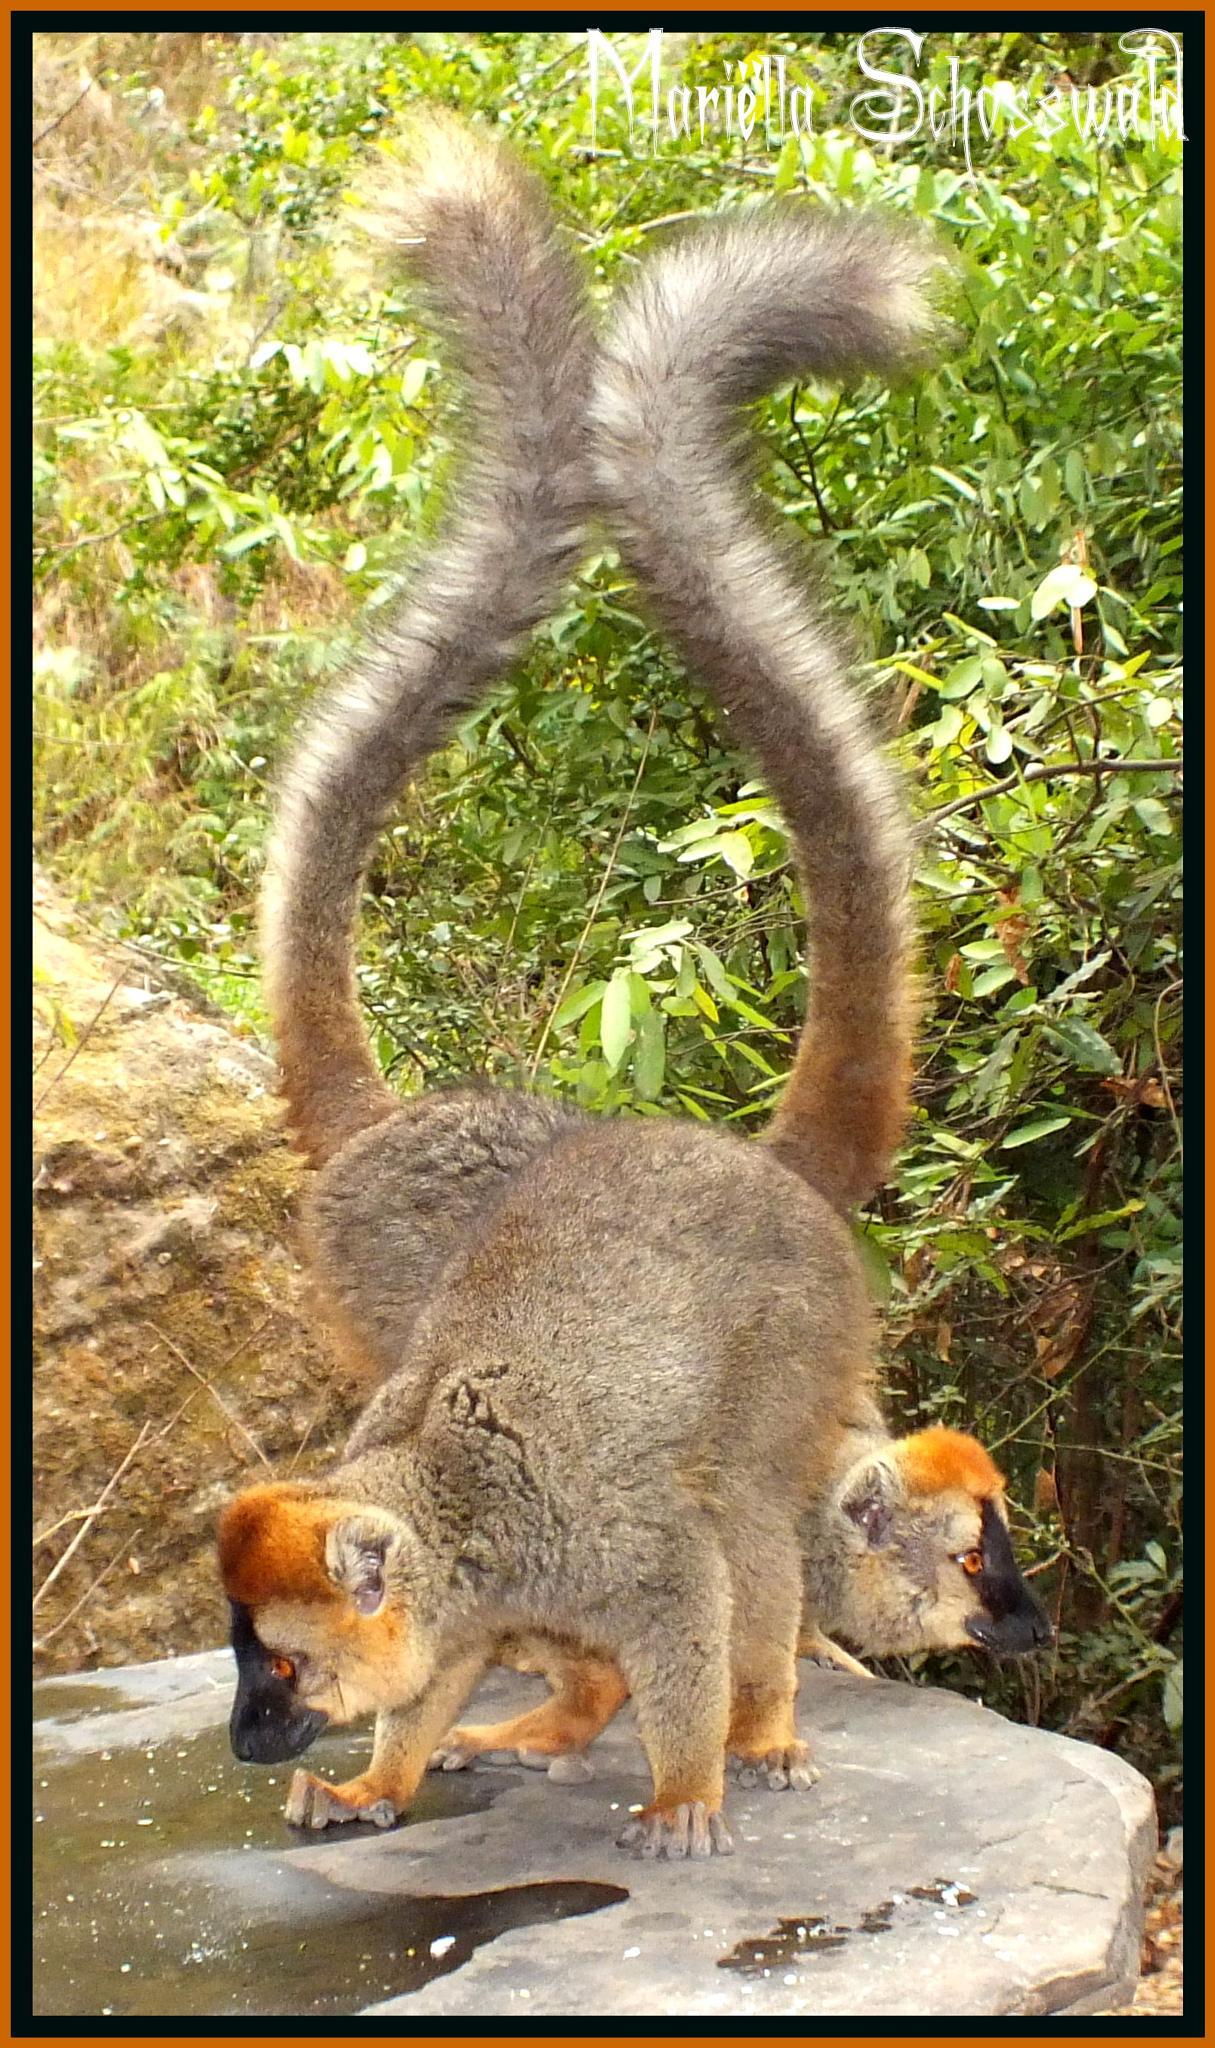 red-fronted lemur (Eulemur rufifrons) by Mariëlla van der Lans-Schosswald